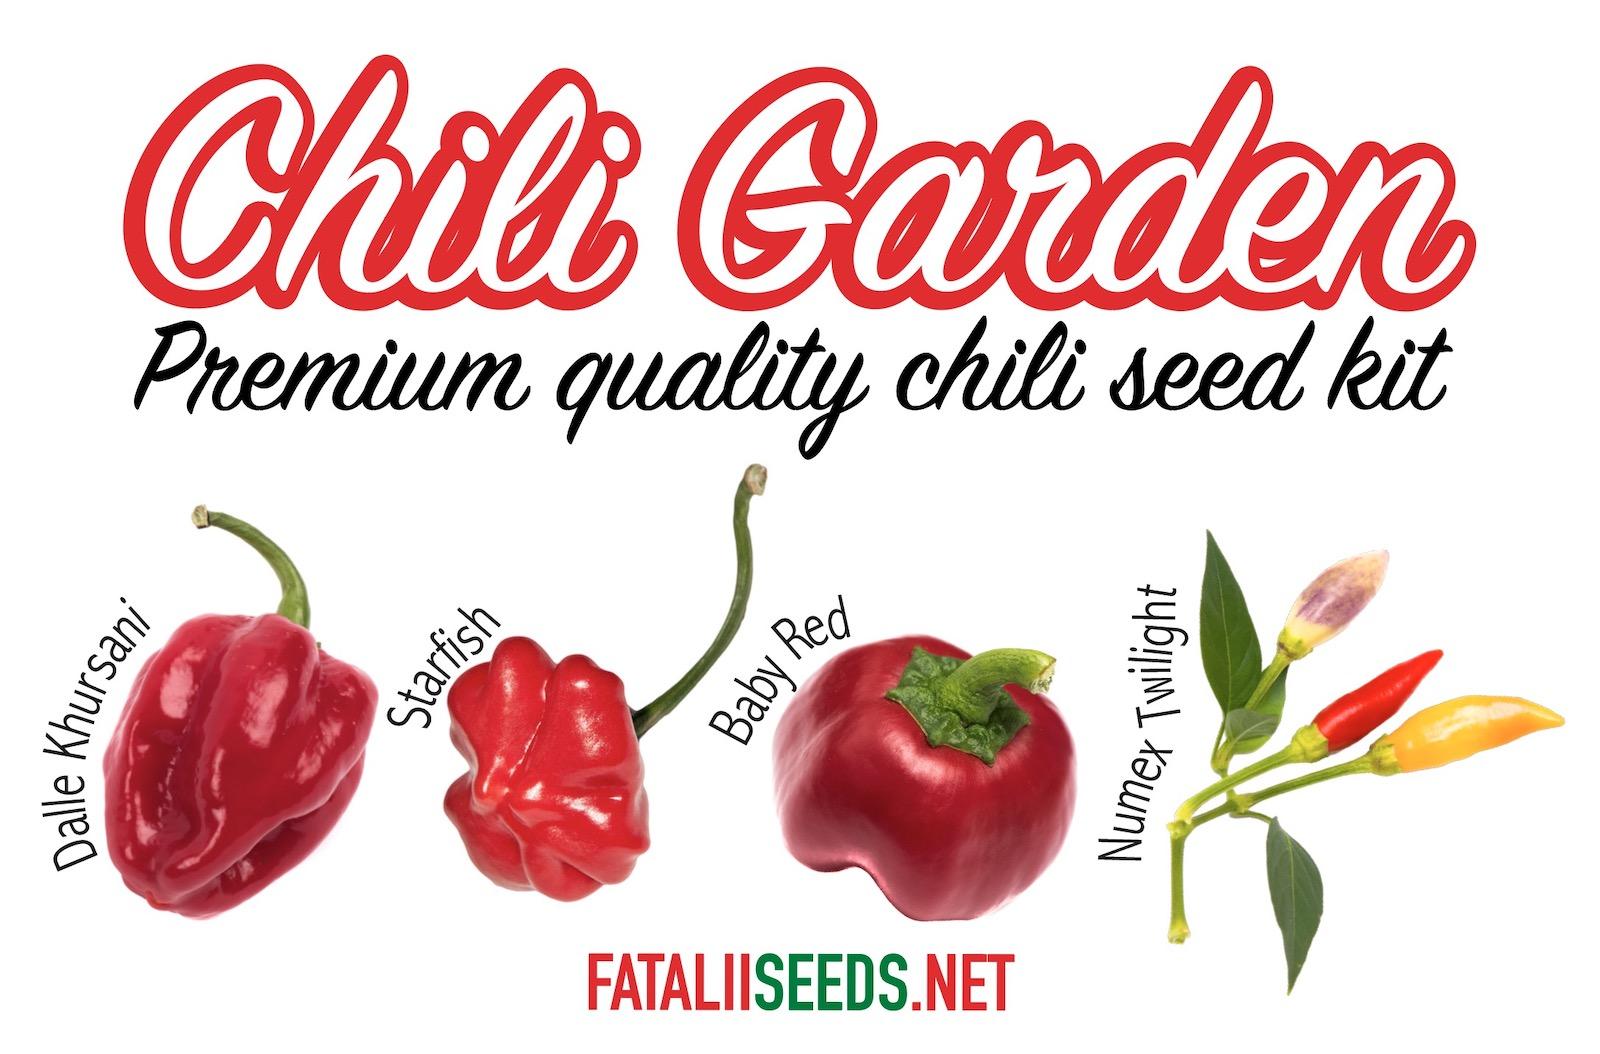 Chili Garden (Seed Kit)